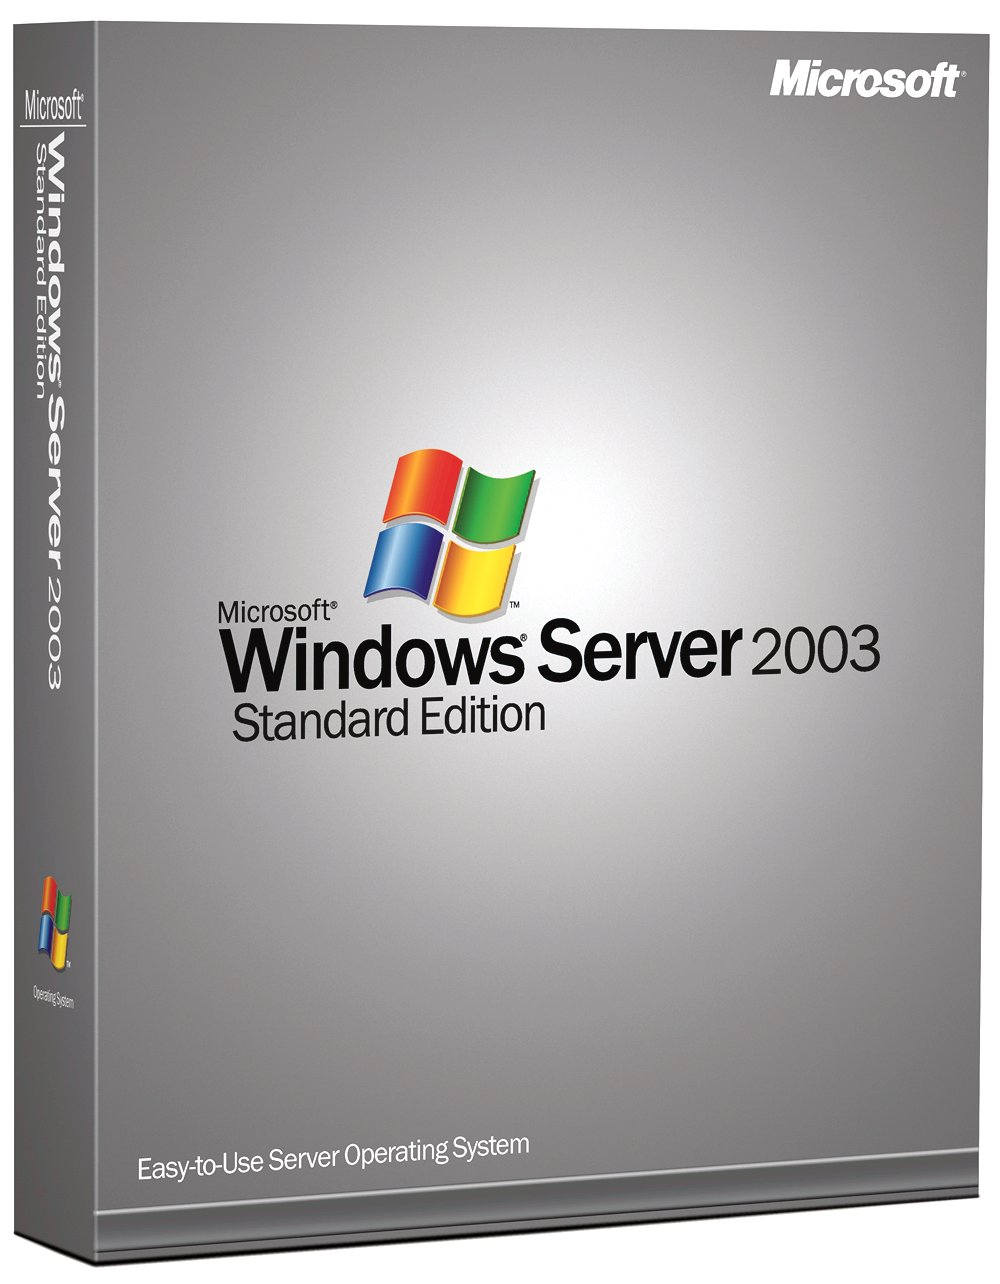 whs 2003